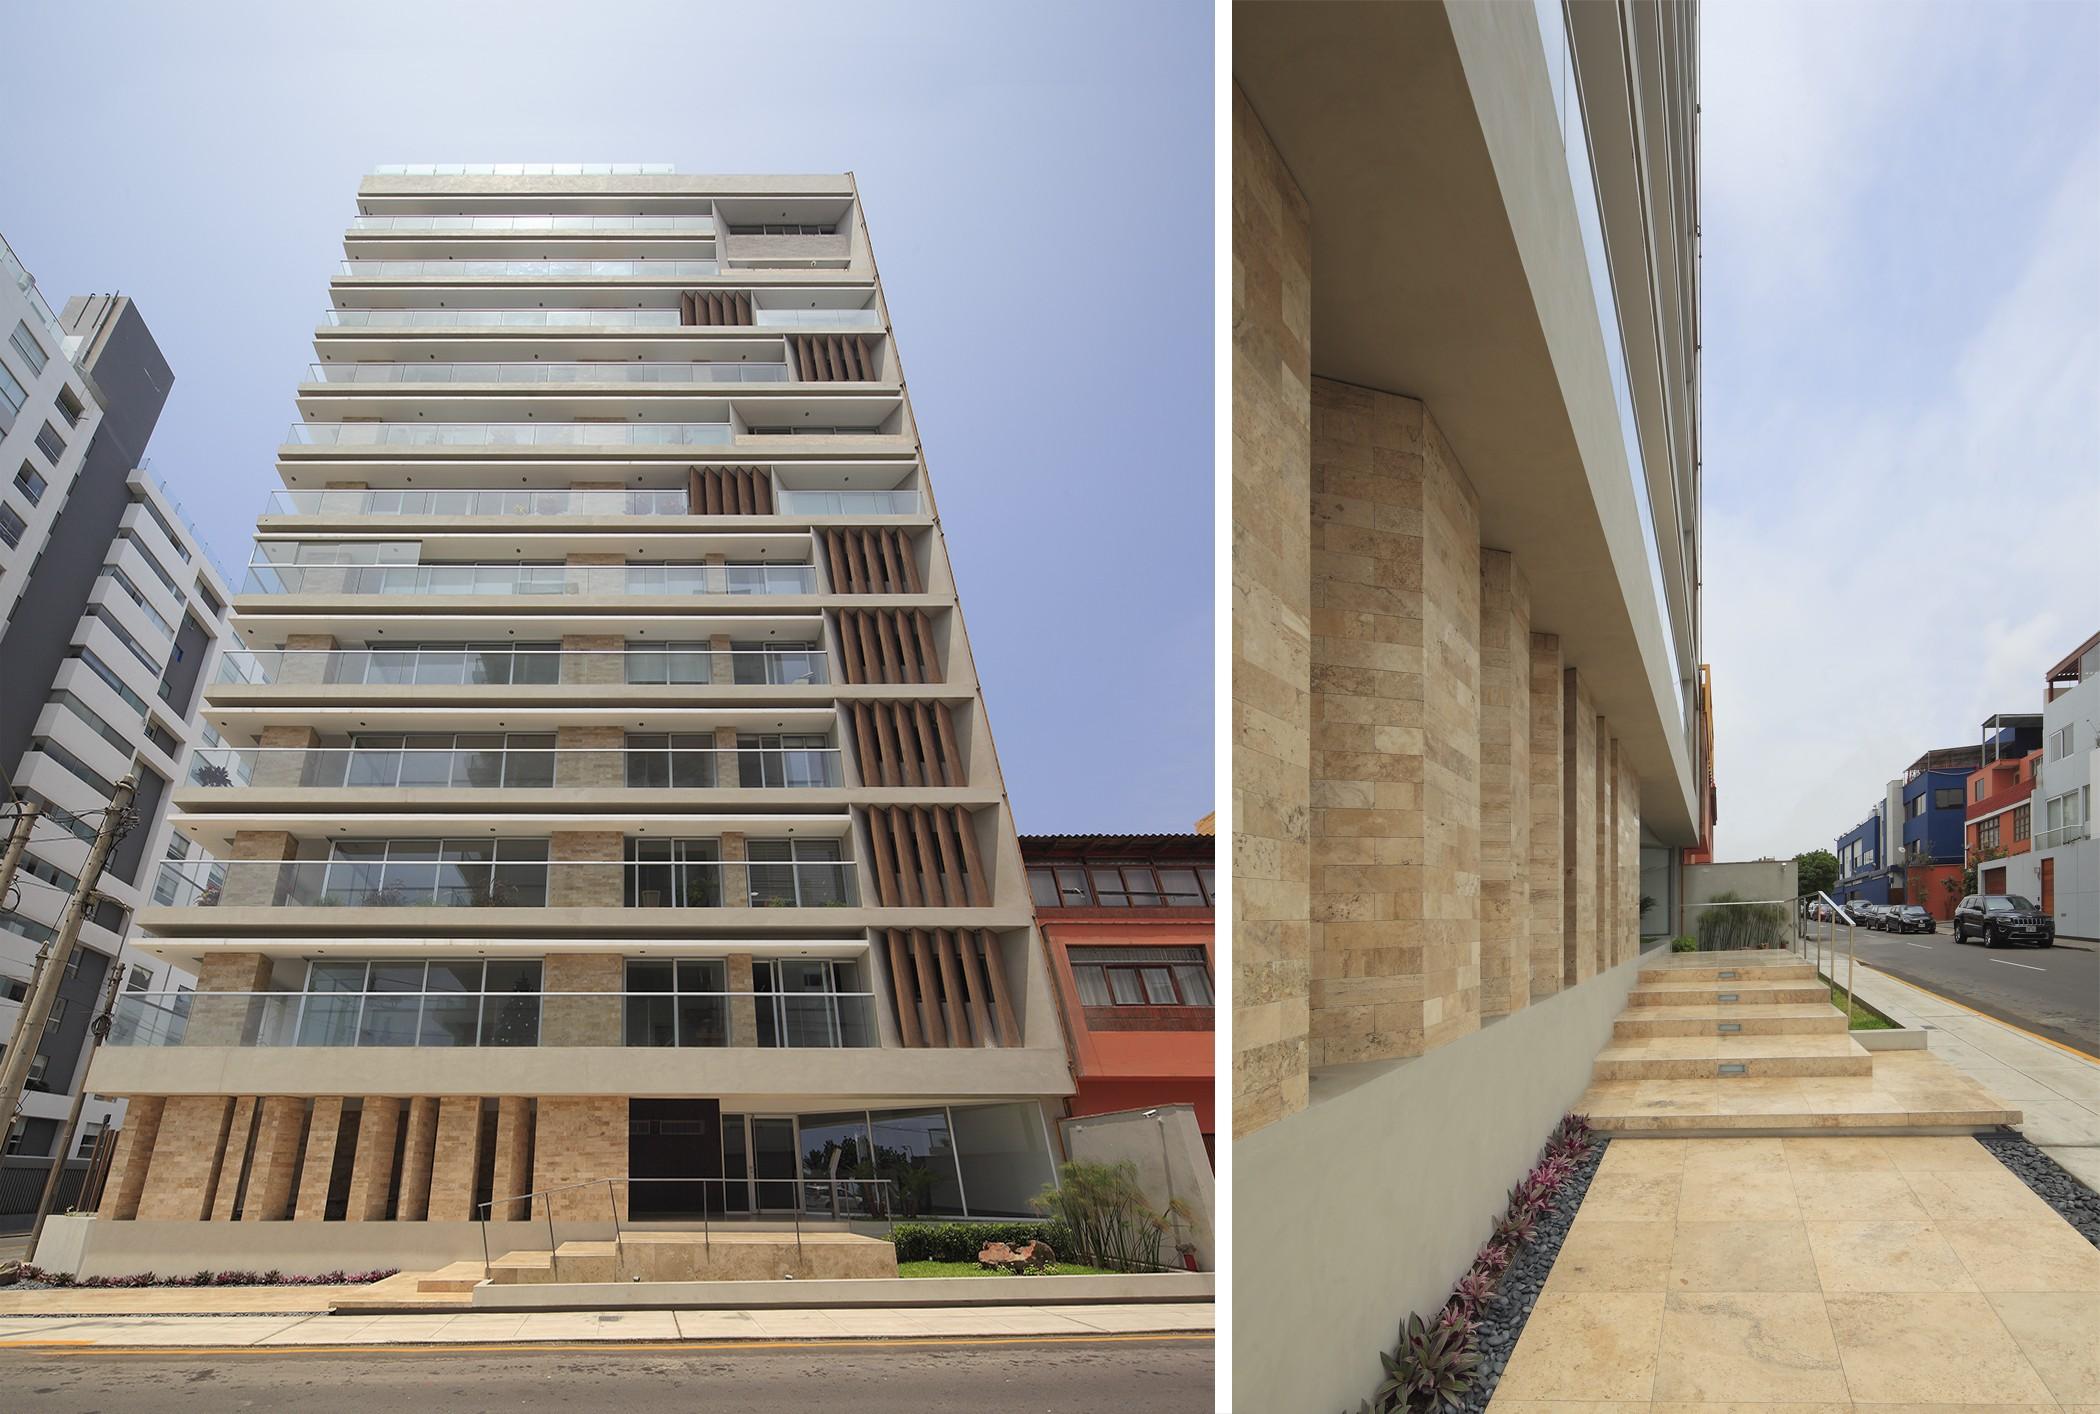 Edificio Multifamiliar Plenamar, Miraflores, Lima, Perú